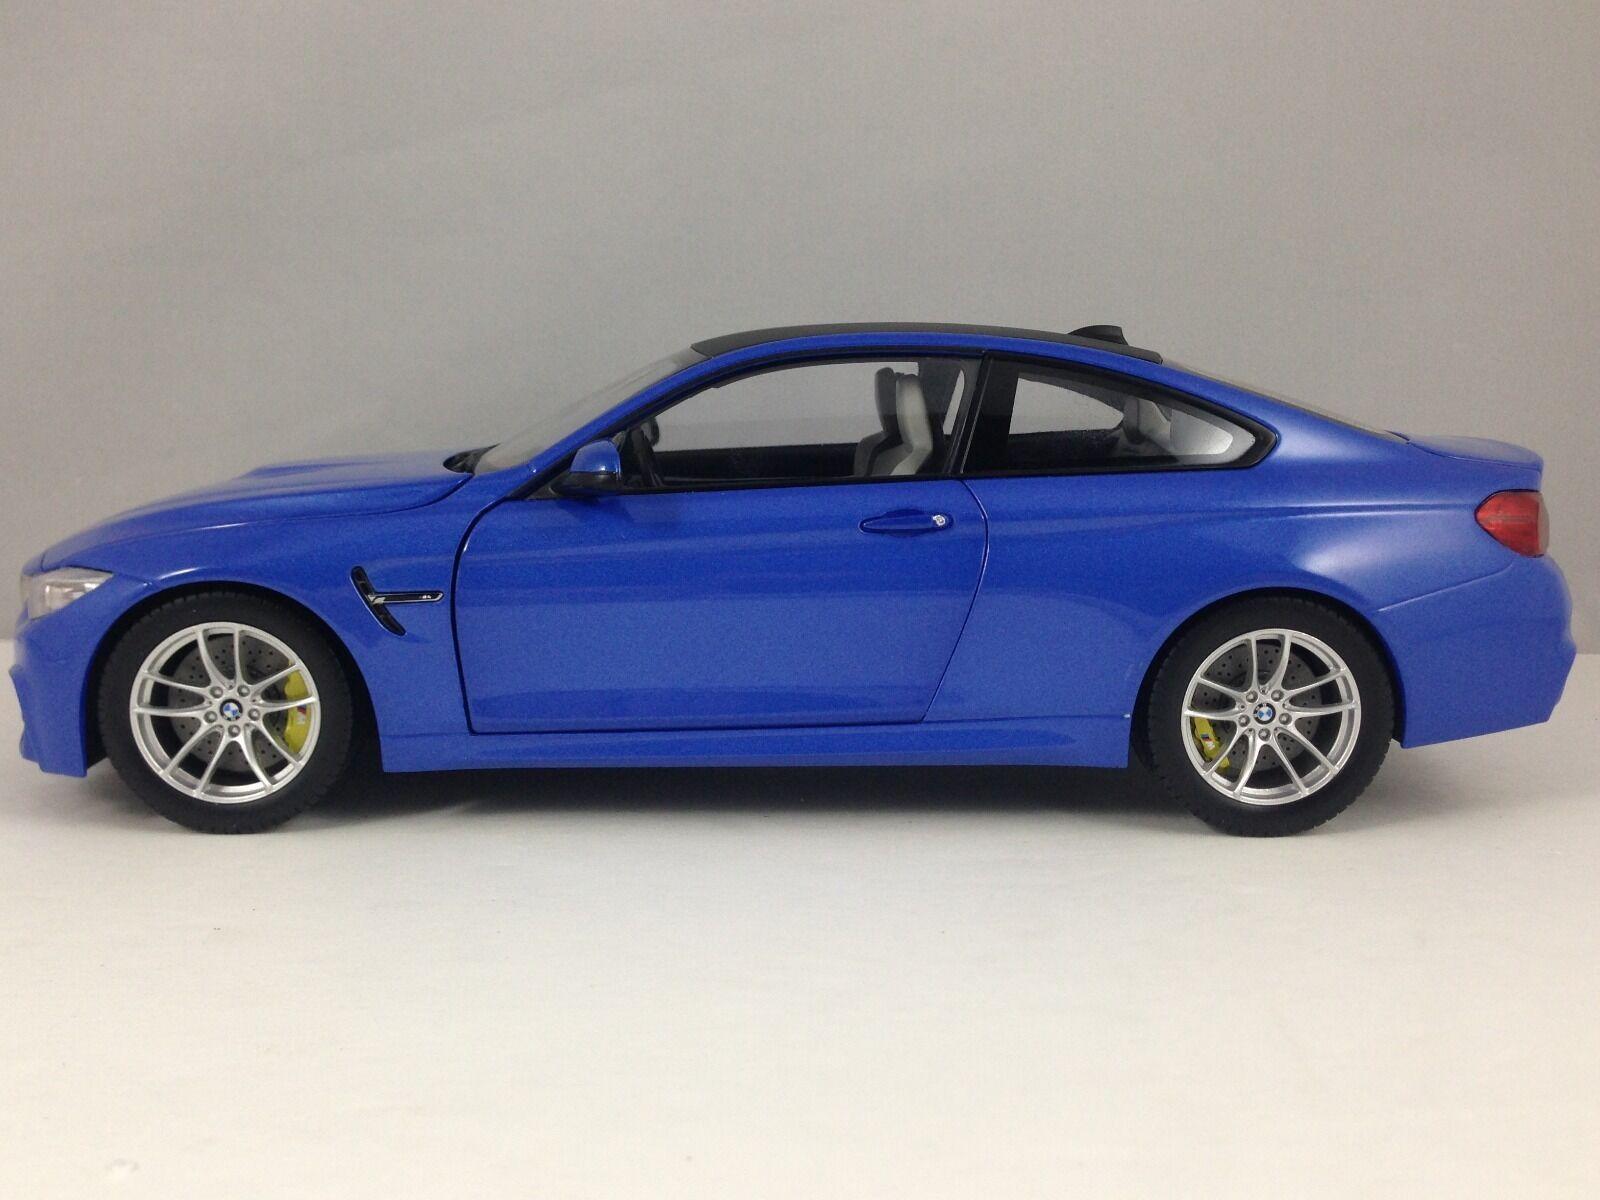 Paragon BMW M4 (F82) blu Marina Modelo Diecast Car 1 18 Nuevo En Caja